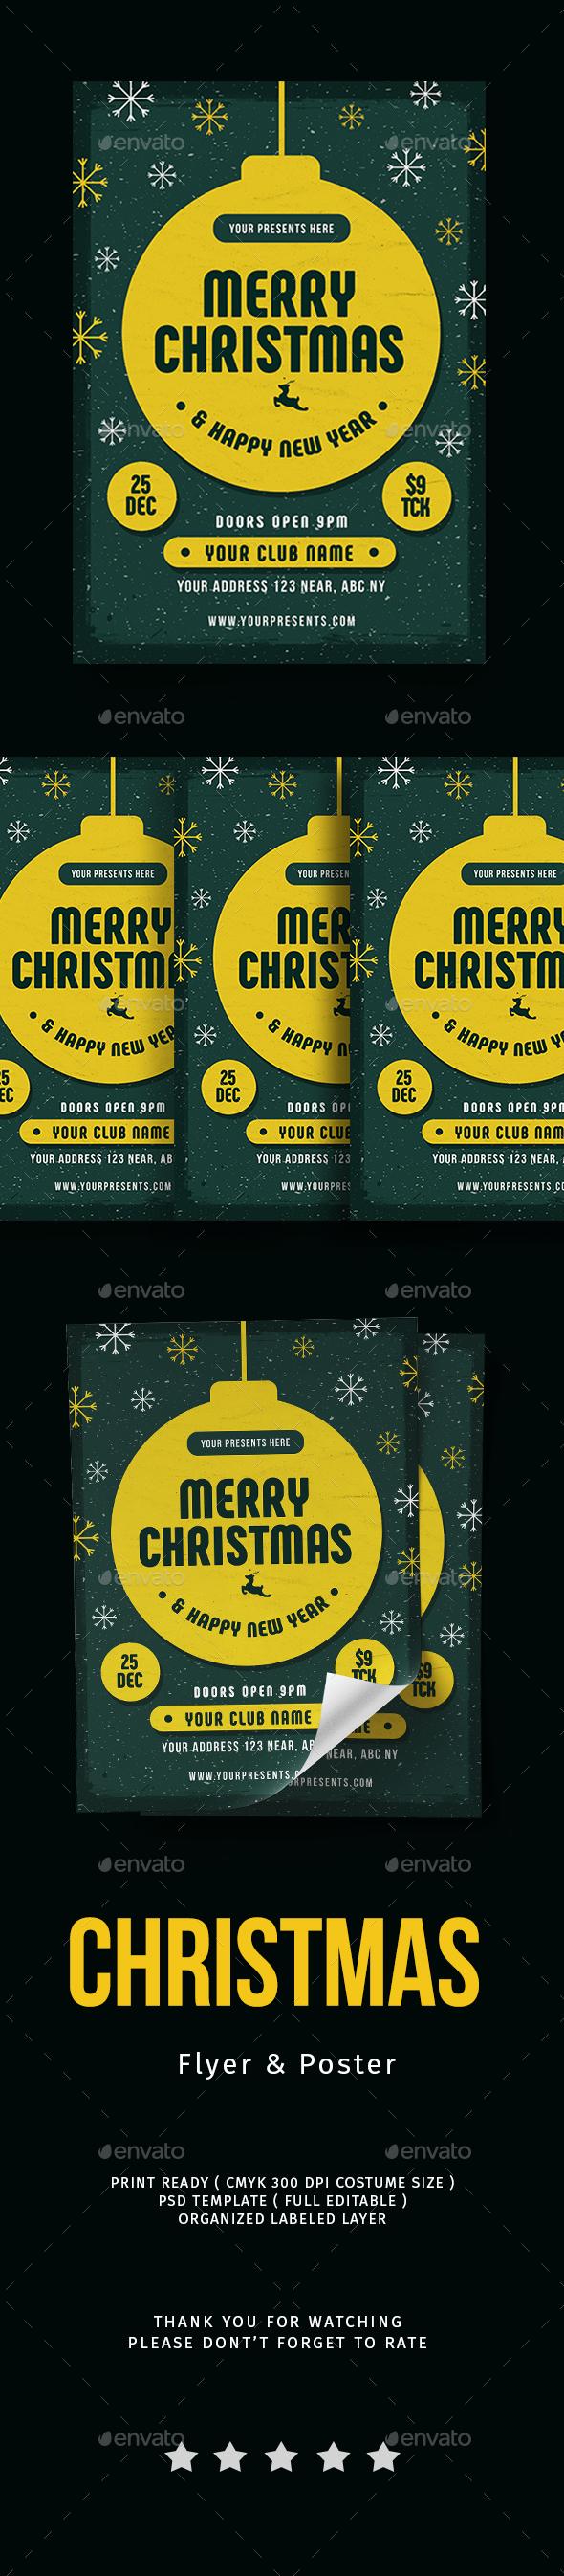 GraphicRiver Christmas Flyer Vol.4 20960748